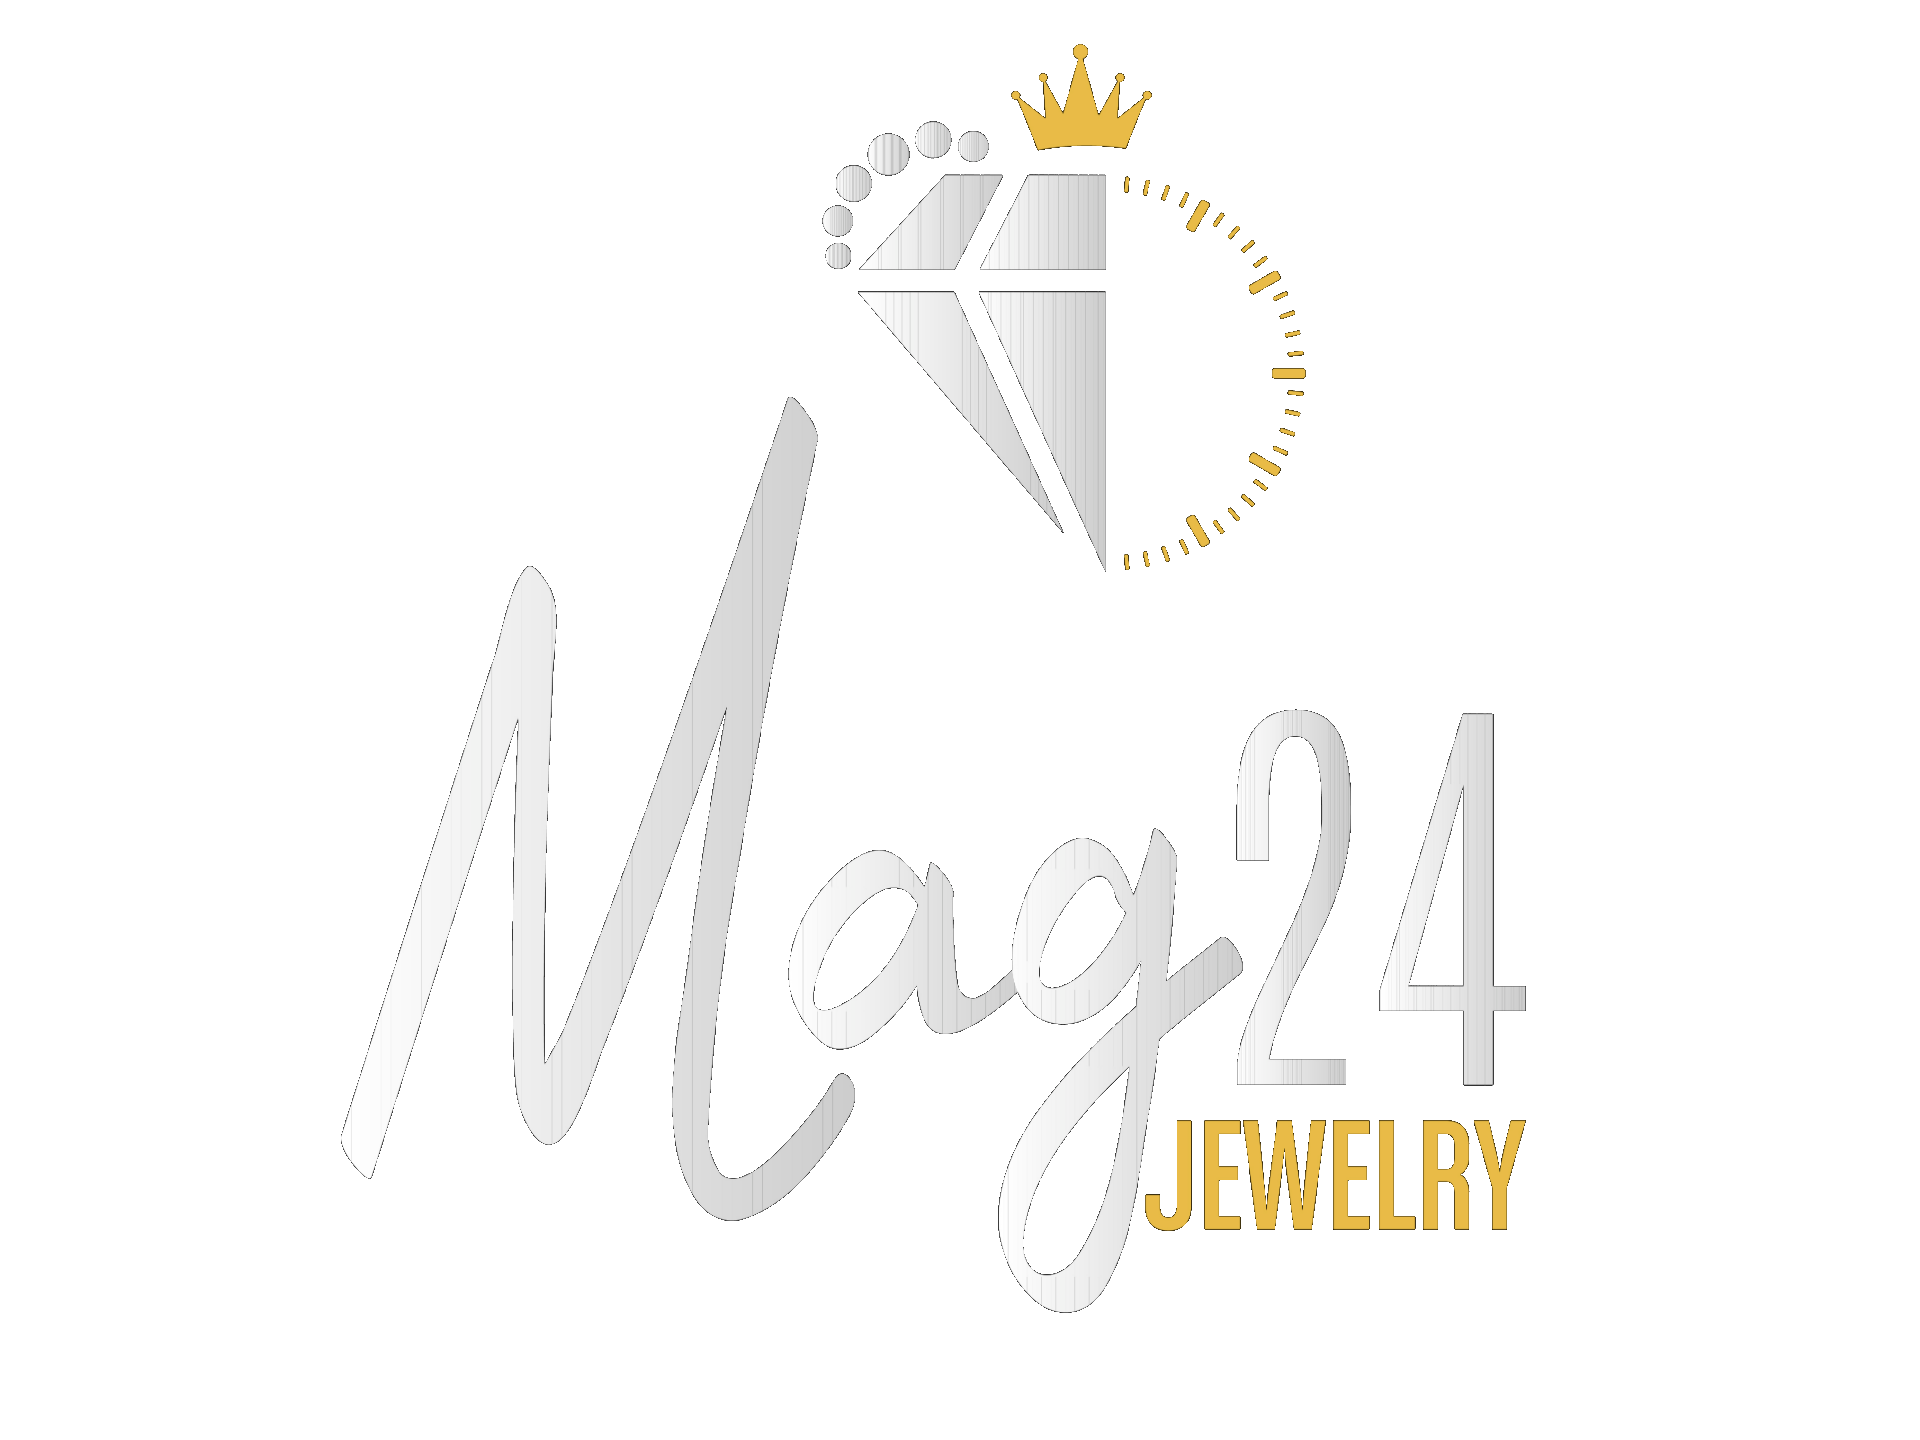 South FL Jewelers